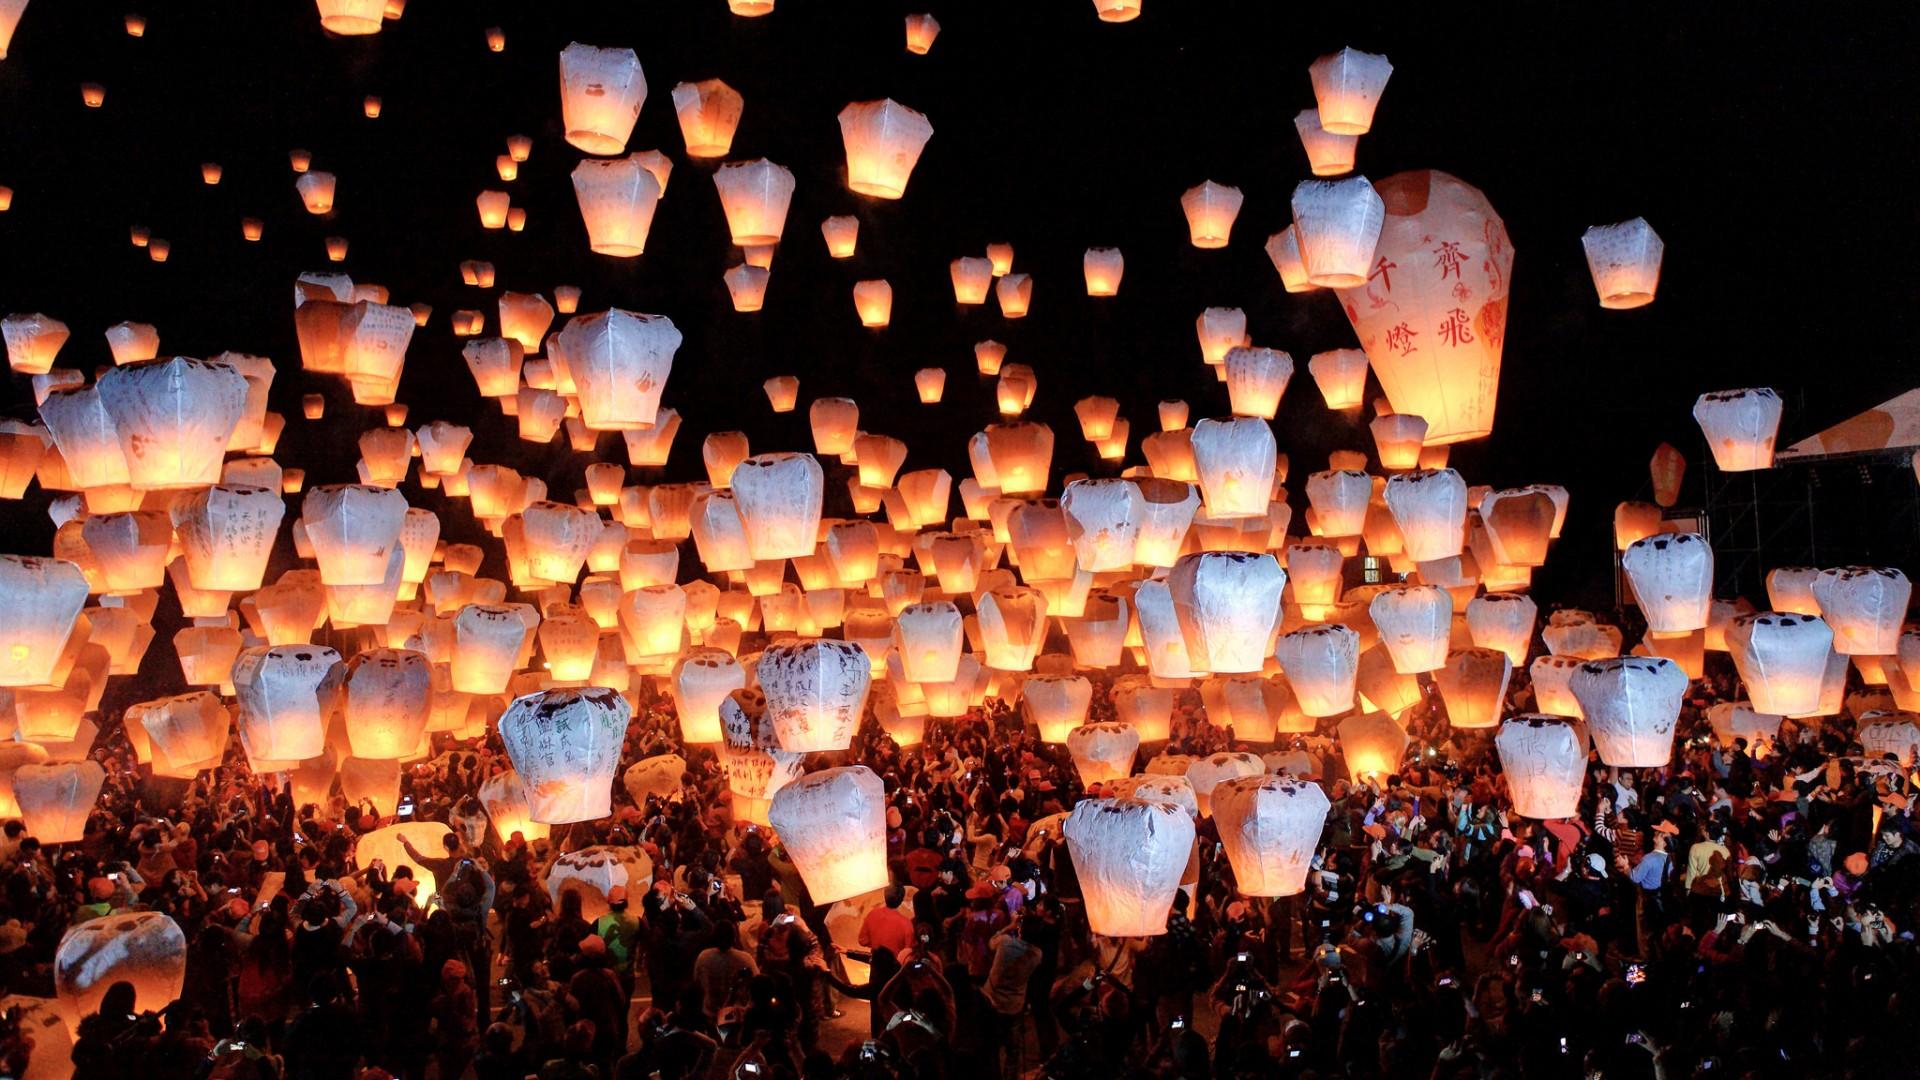 Wallpaper night China Taiwan sky lantern Launching sky lanterns at 1920x1080